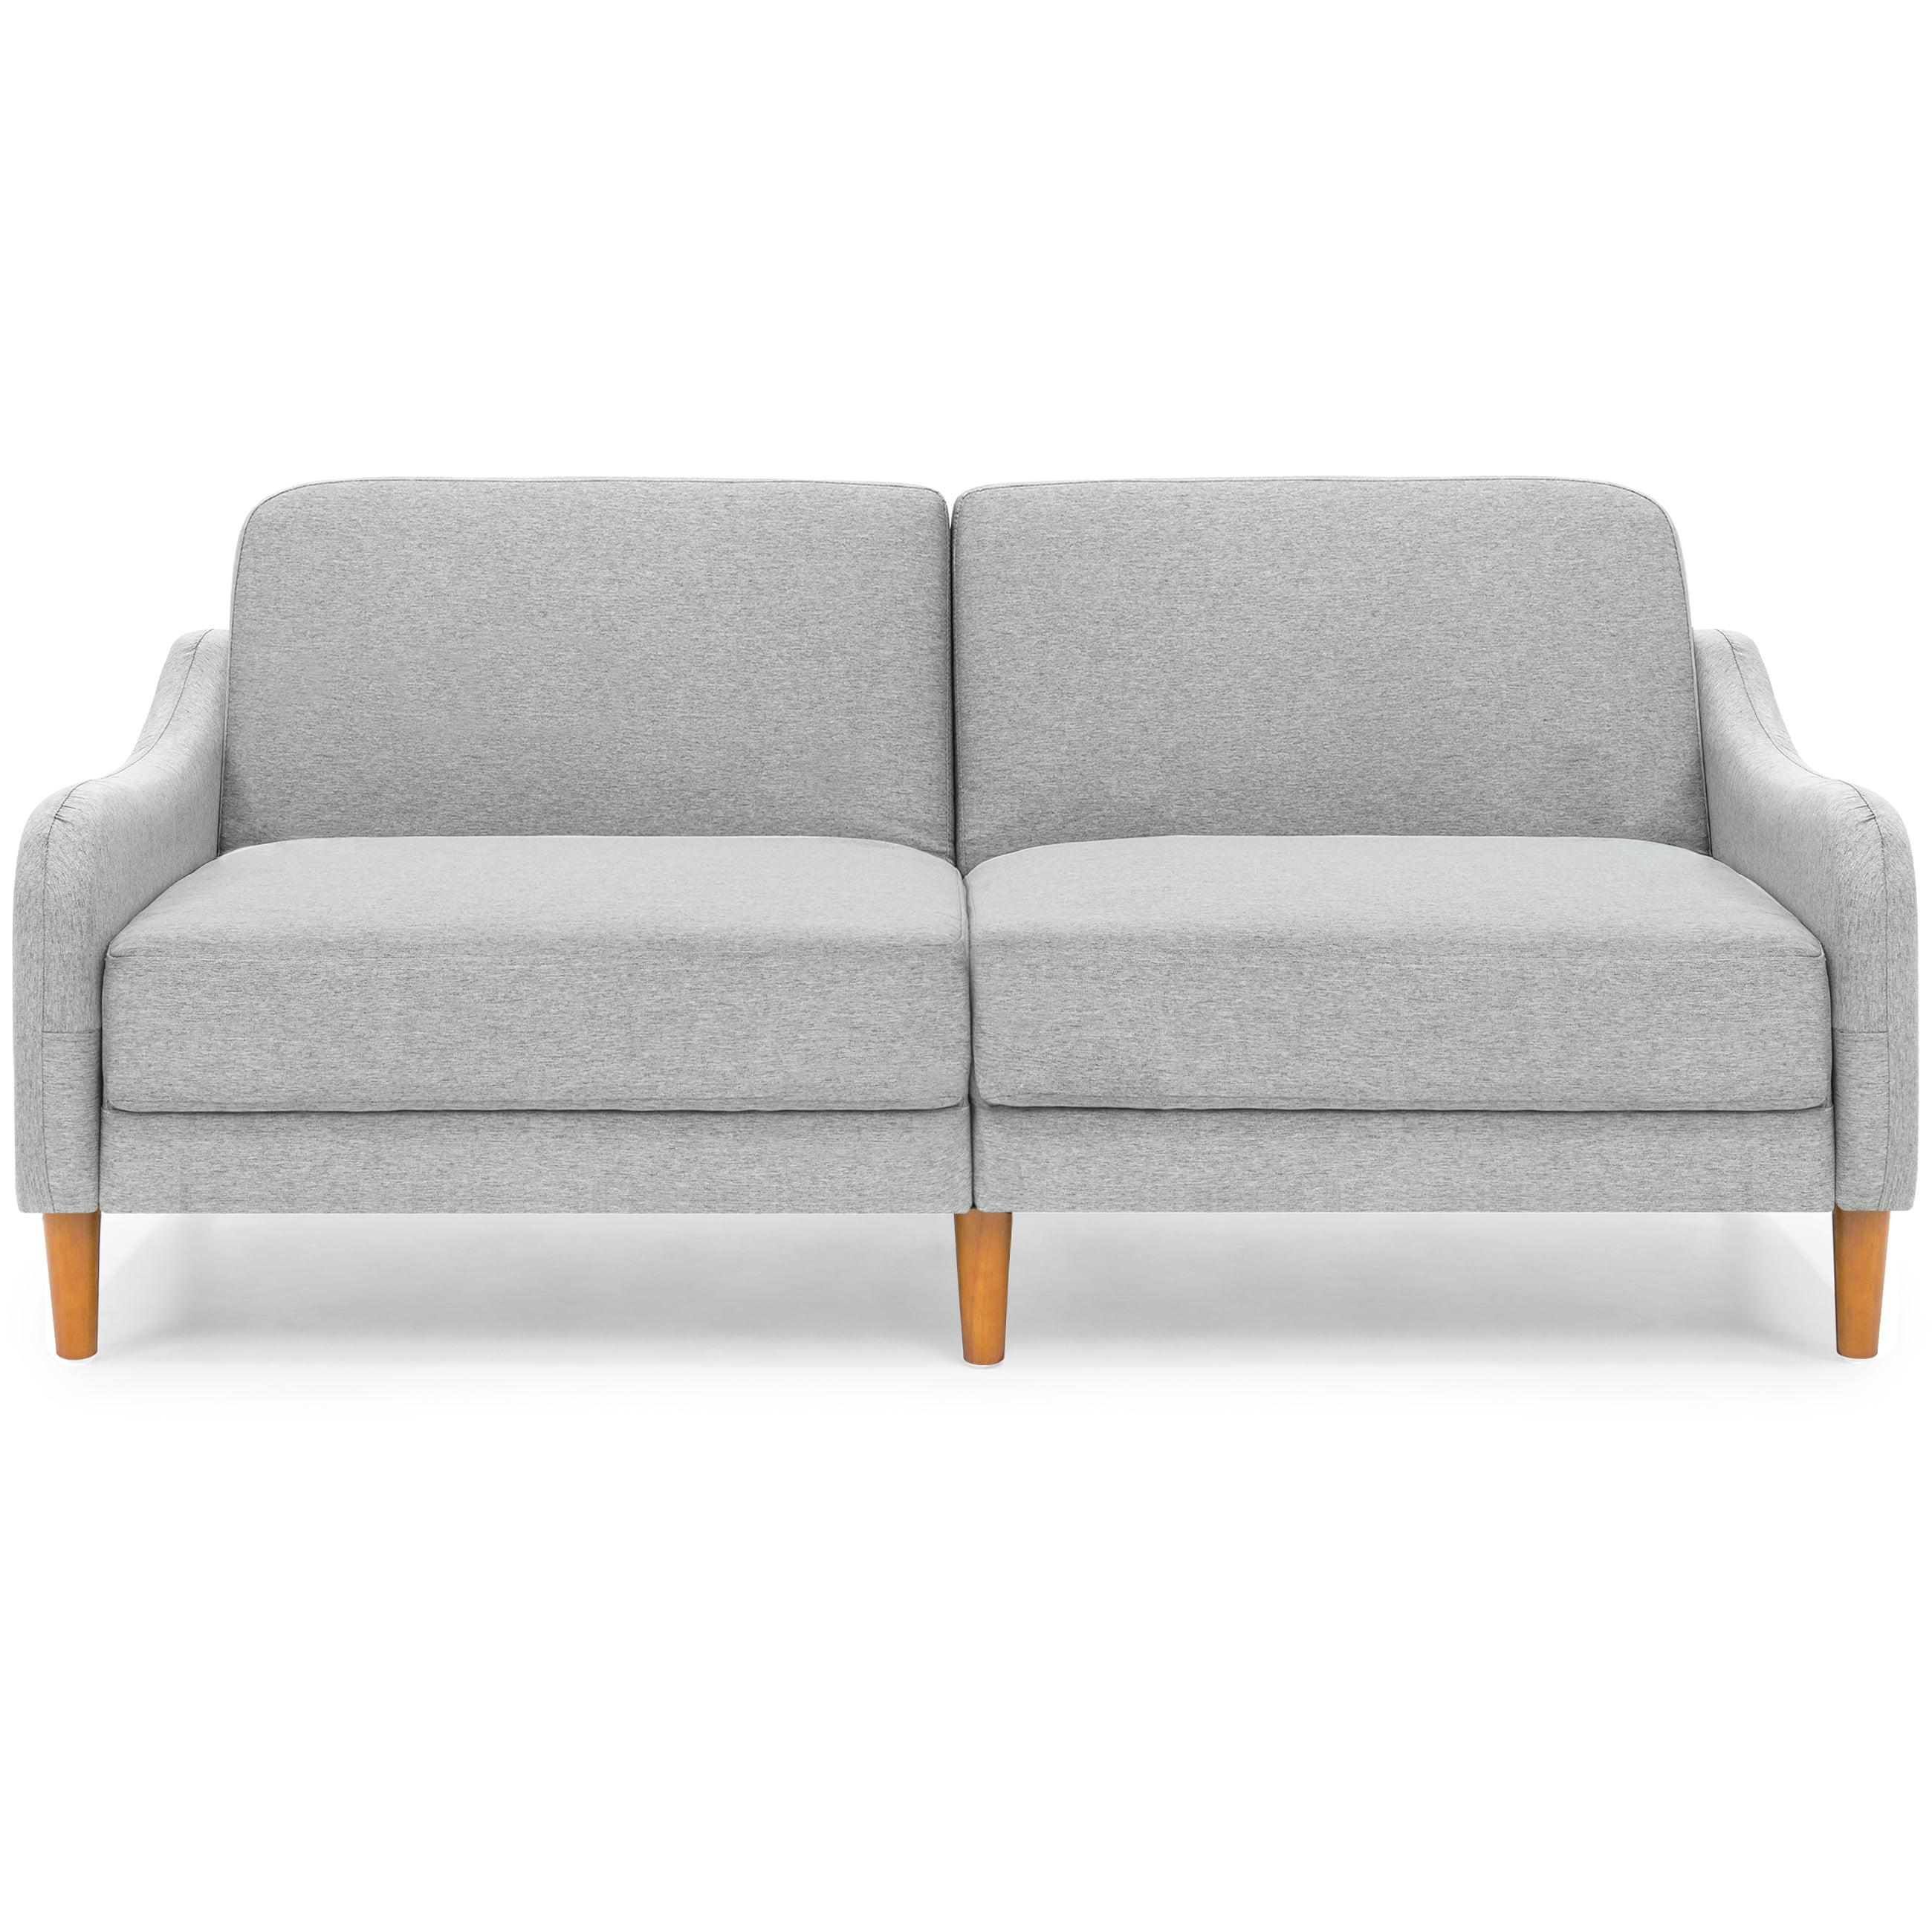 Best Choice Products Mid Century Modern Linen Futon Sofa Gray